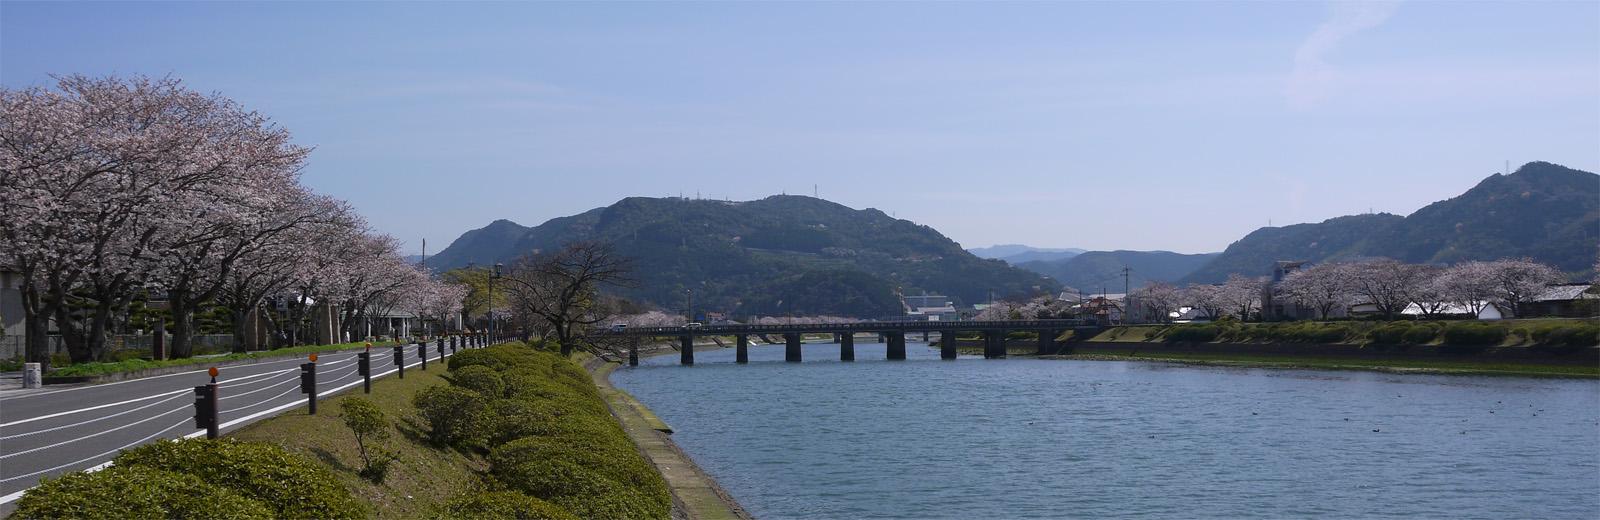 水俣川河畔の桜 | 熊本県水俣市 | 福岡発!! 九州観光ガイド